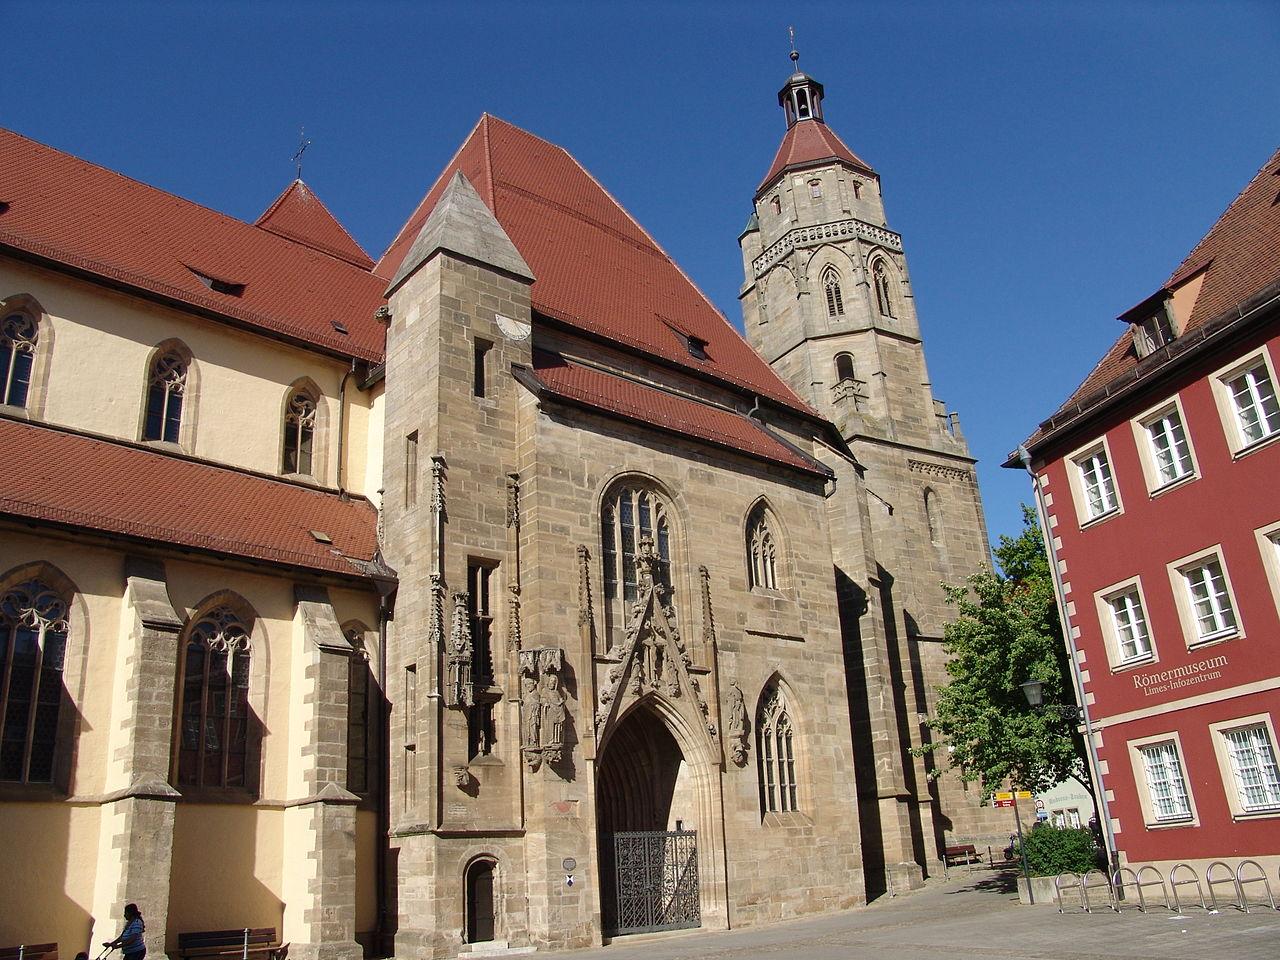 Bild St. Andreas Kirche Weißenburg